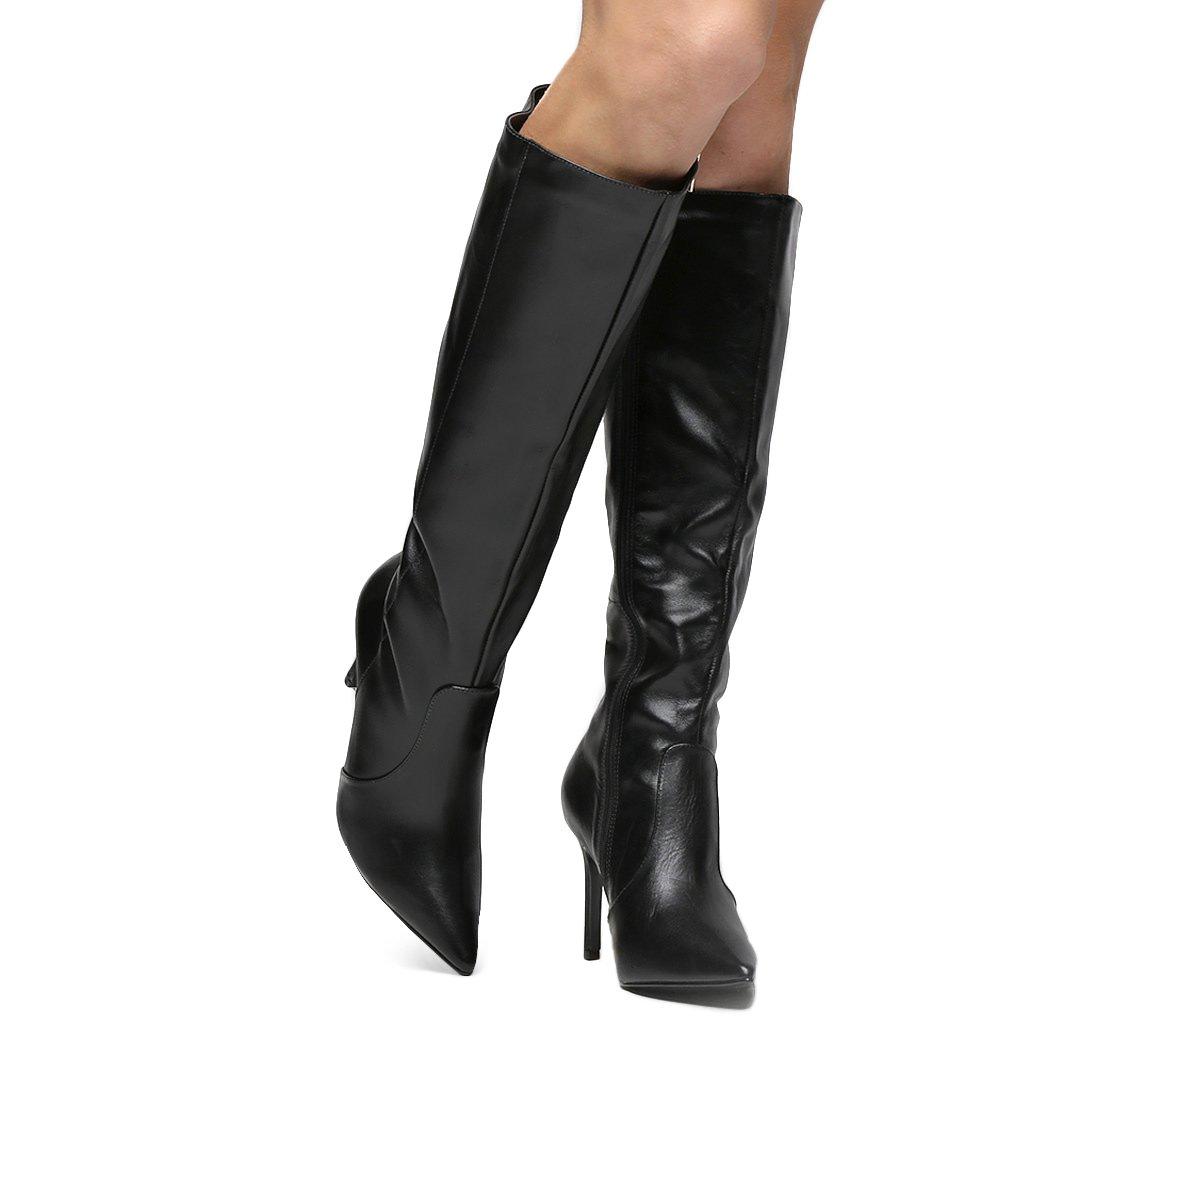 Bota Feminina Bico Bota Couro Preto Montaria Fino Shoestock Couro rBr0Xqw